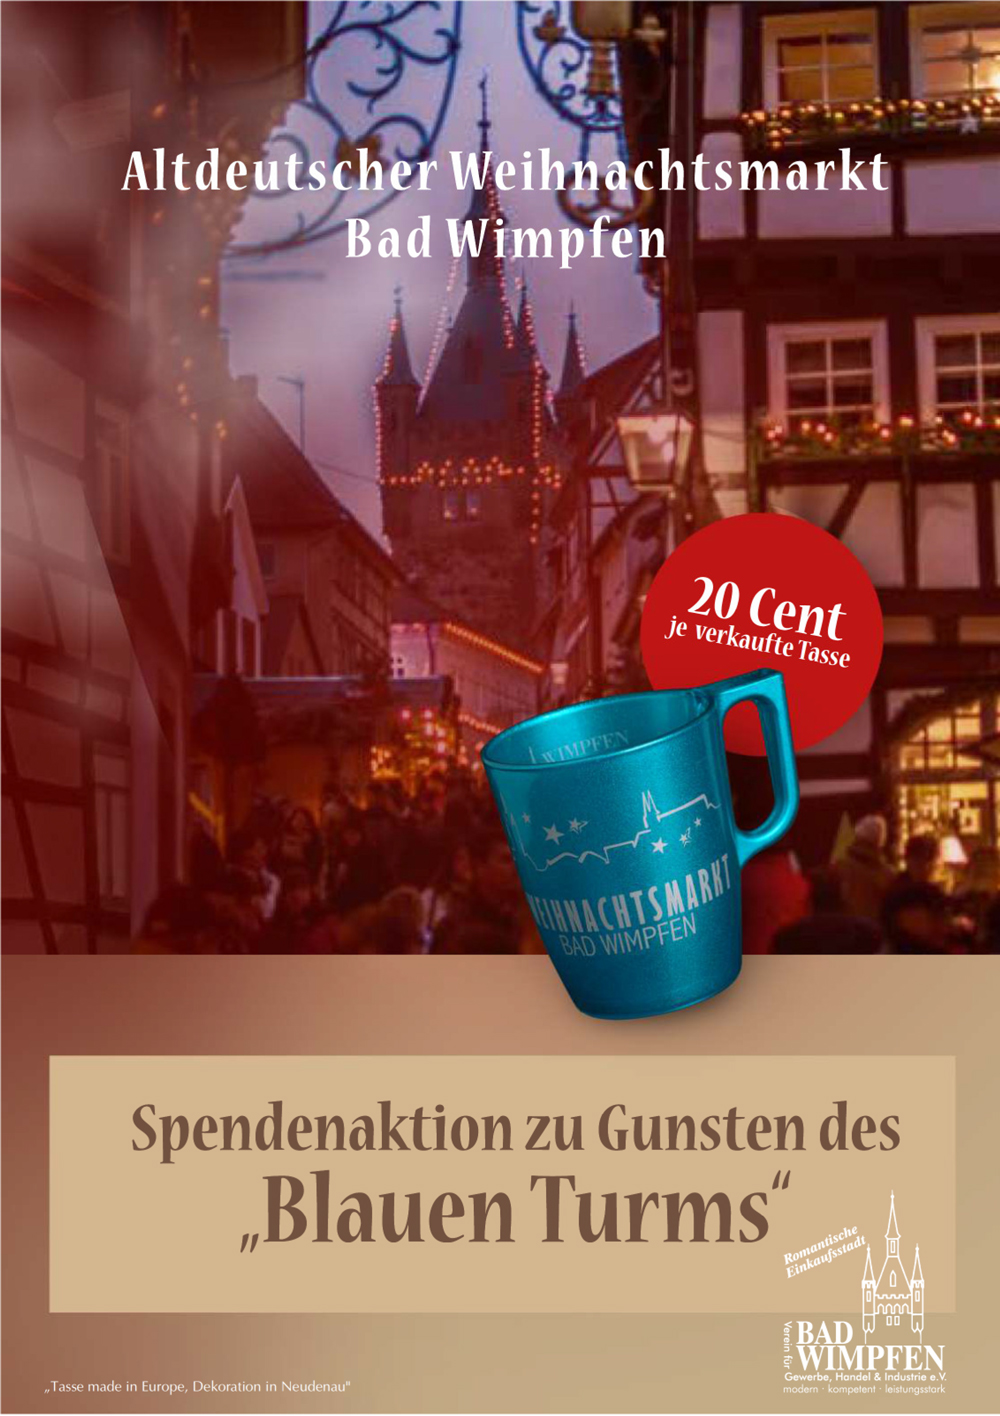 spendenaktion-blauer_turm-1